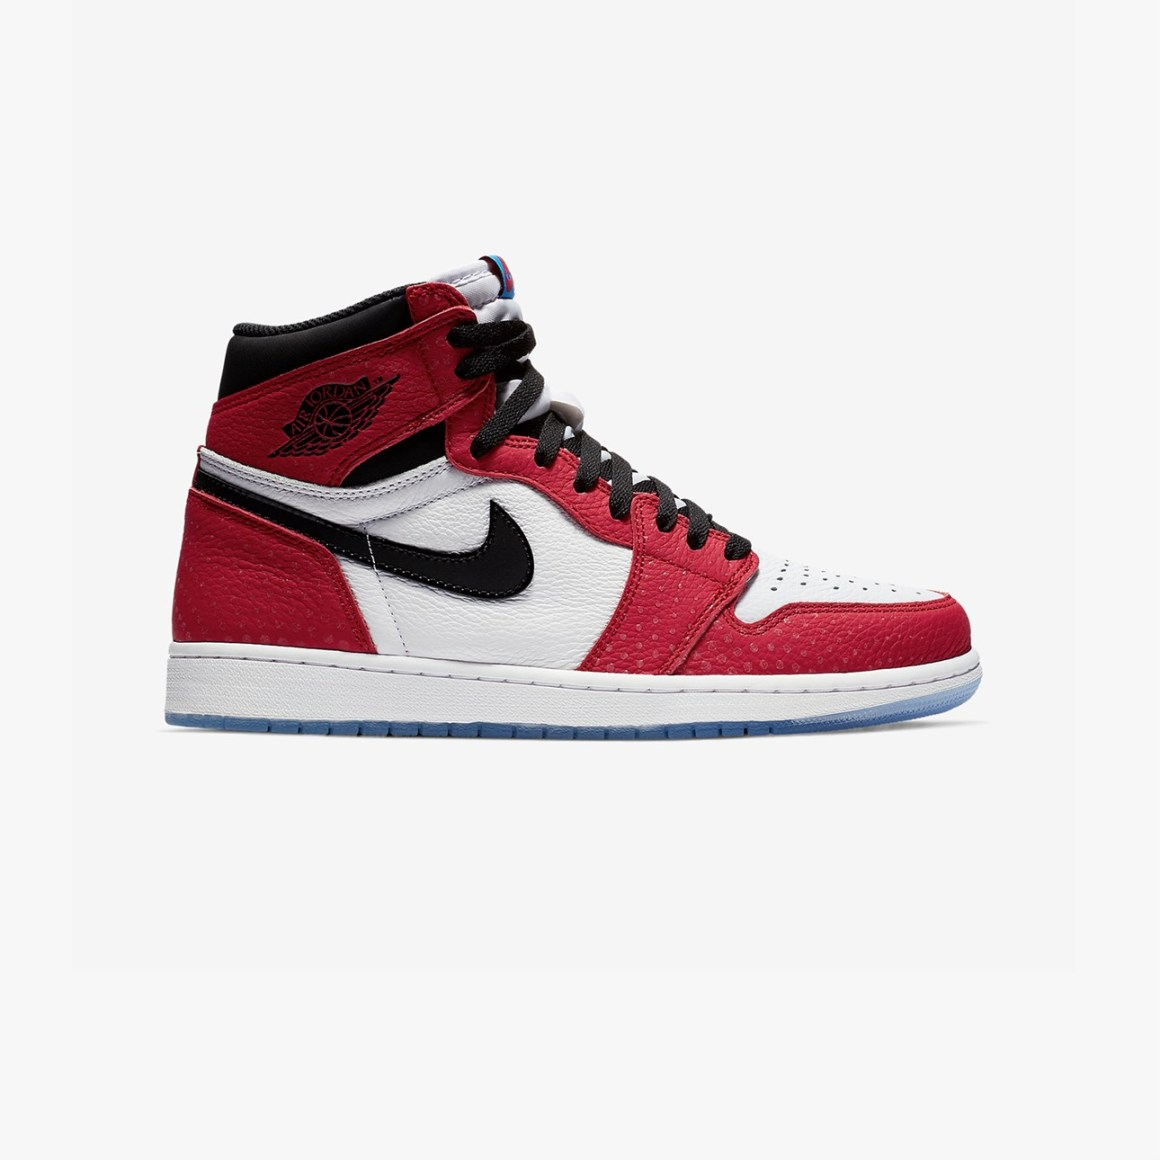 Jordan Brand Air Jordan 1 Retro High OG